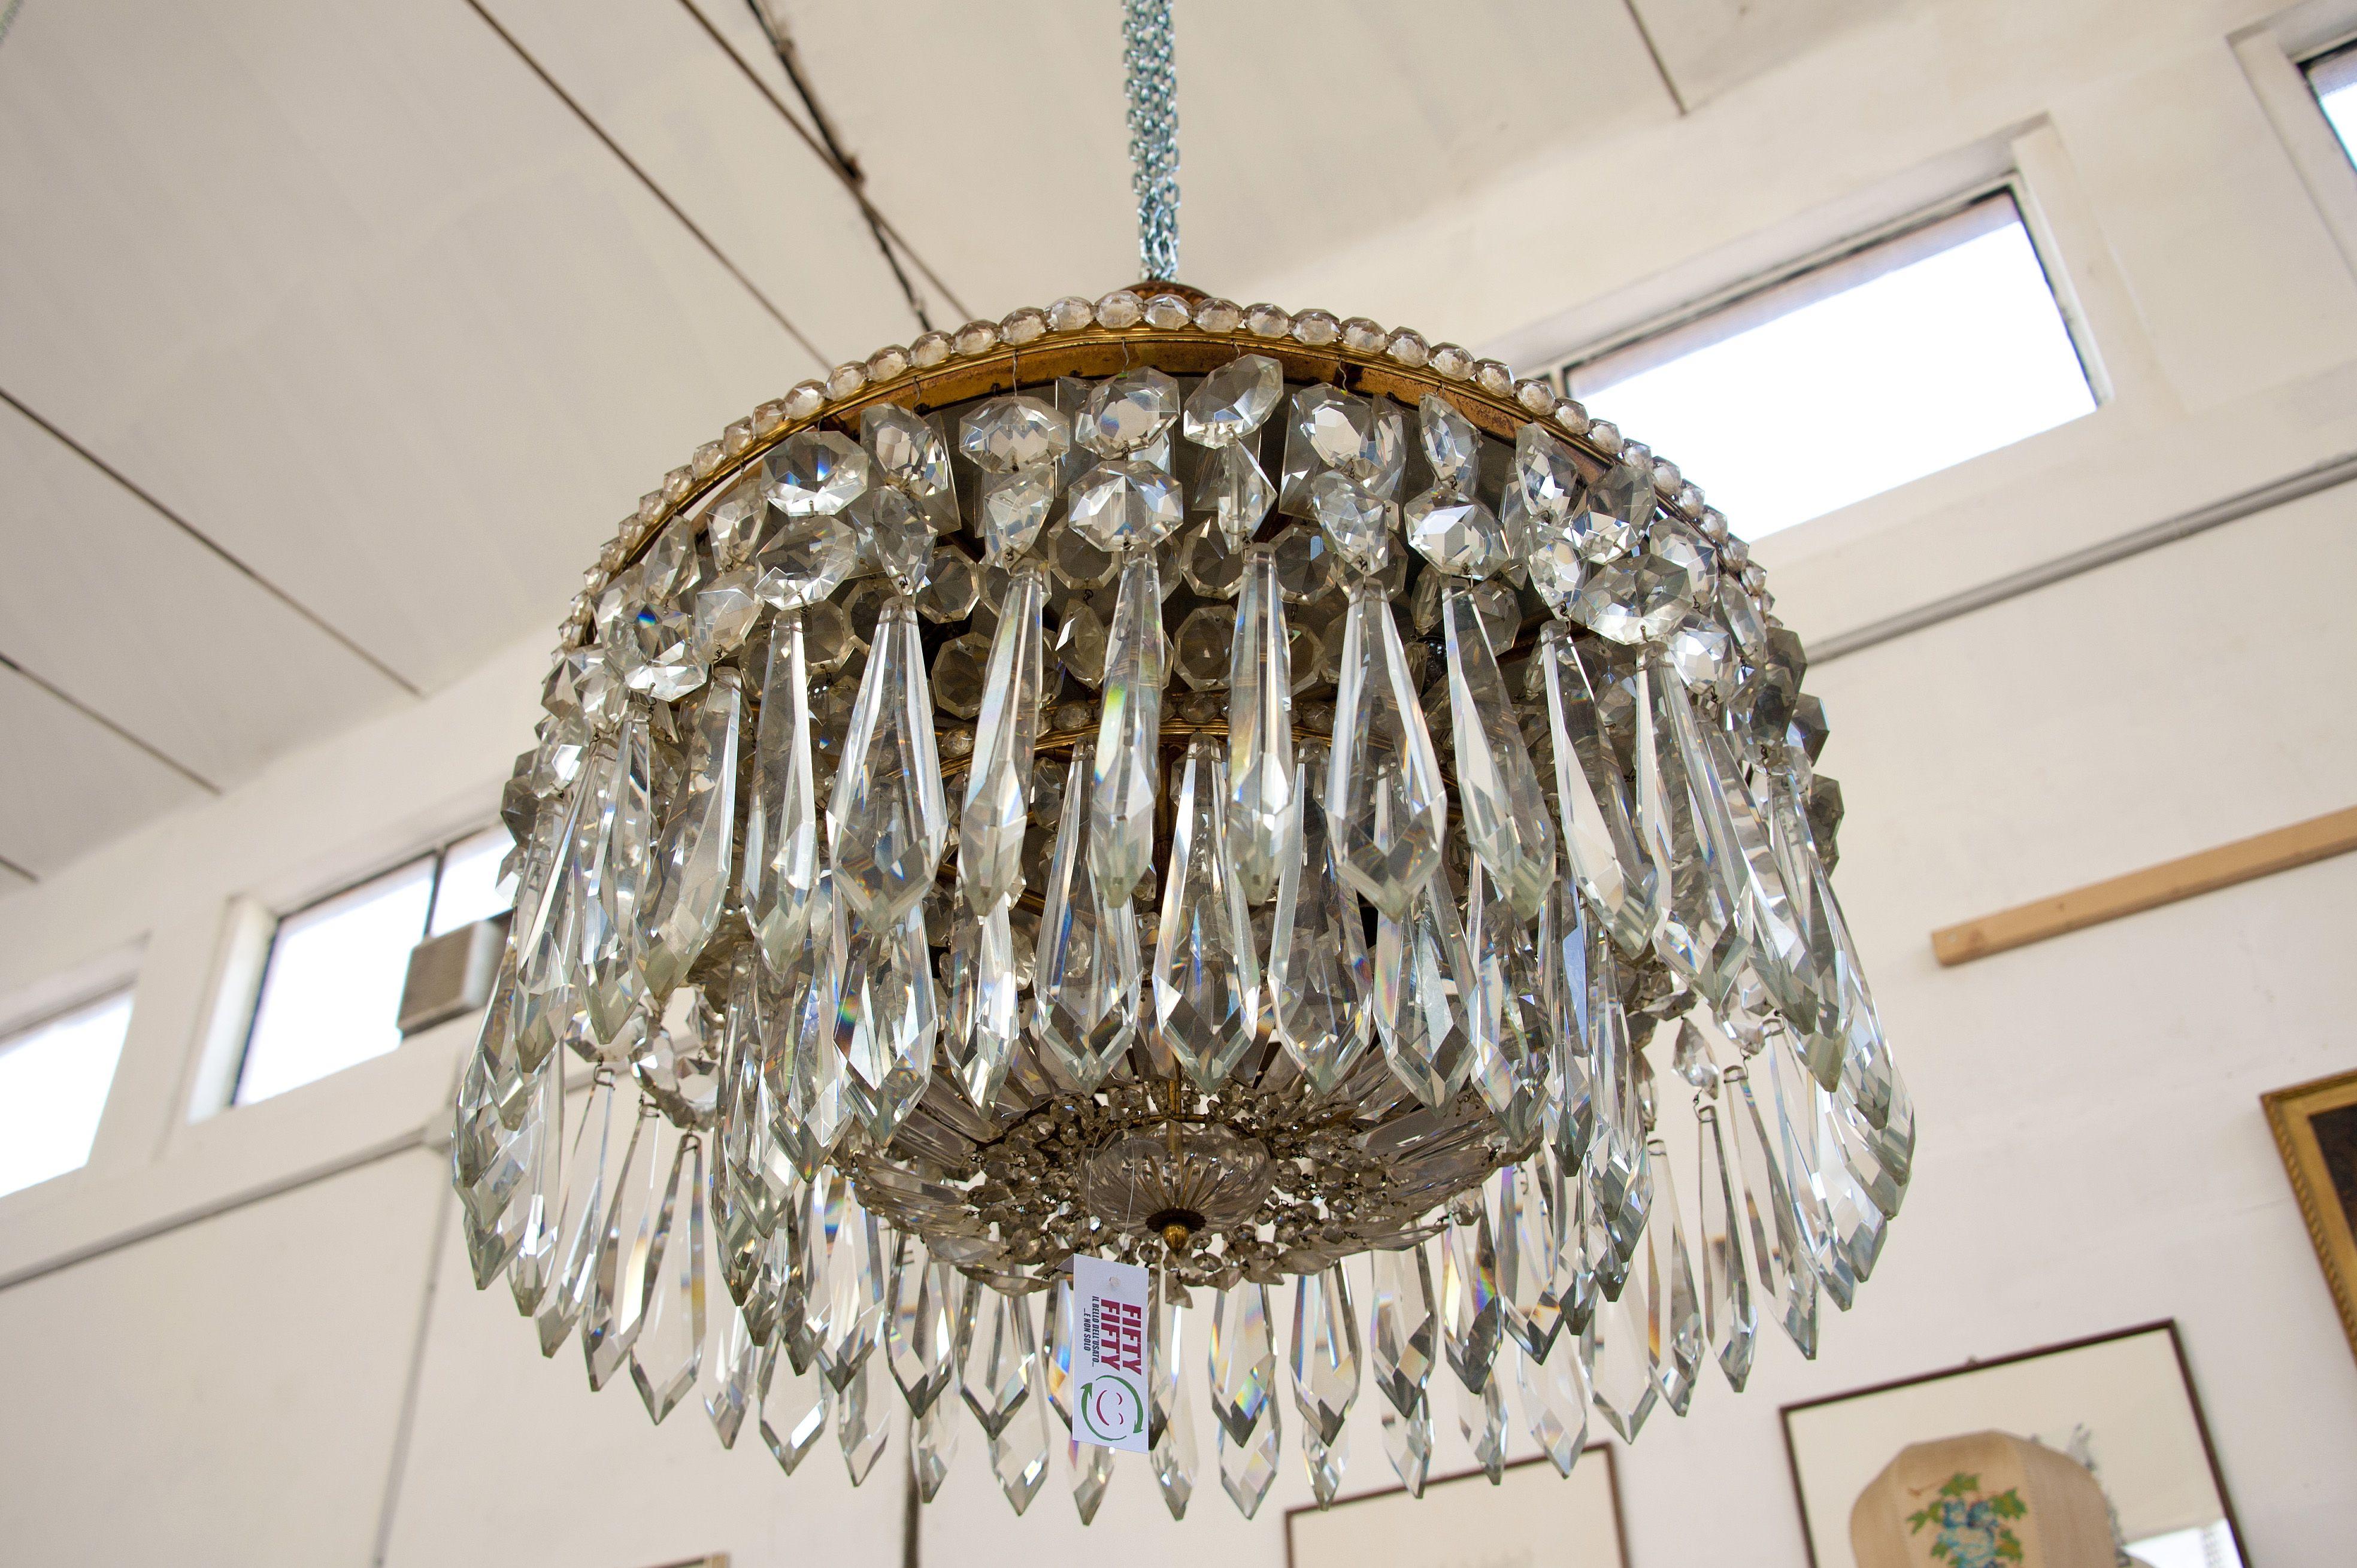 Lampadario rotondo in cristallo. Diametro 85 cm